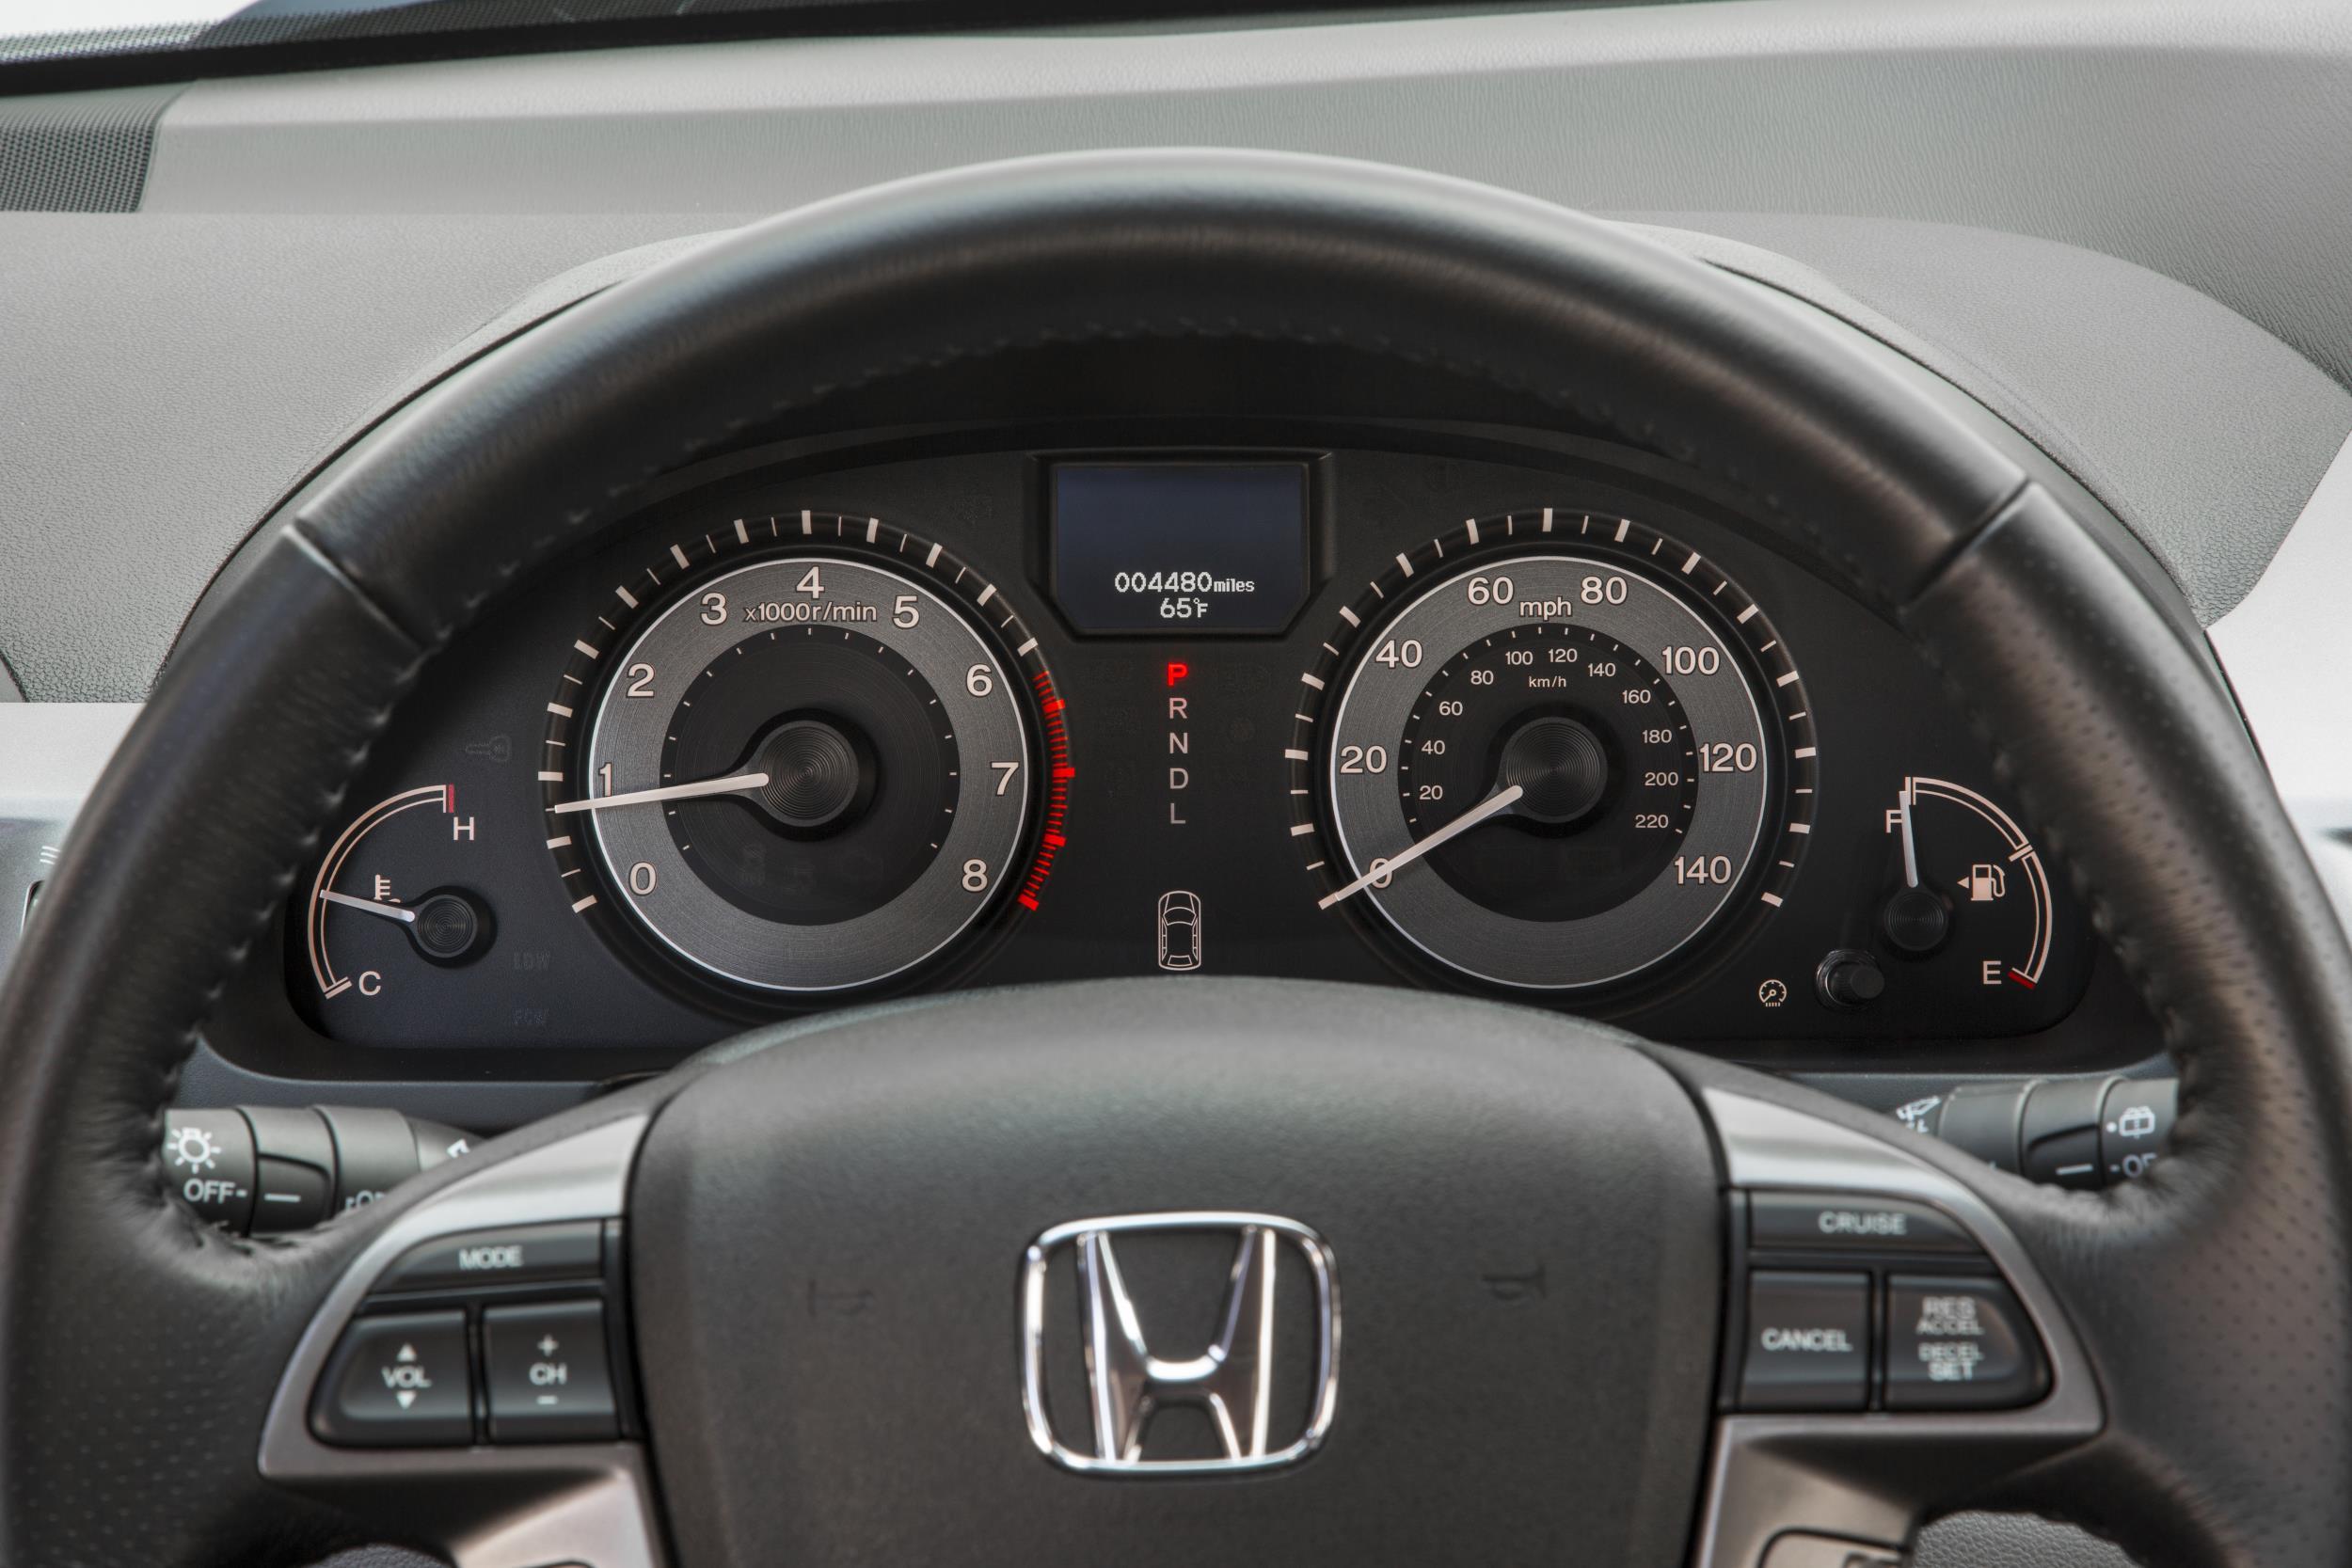 Honda Recalls 633,753 Odyssey Minivans Over Second Row